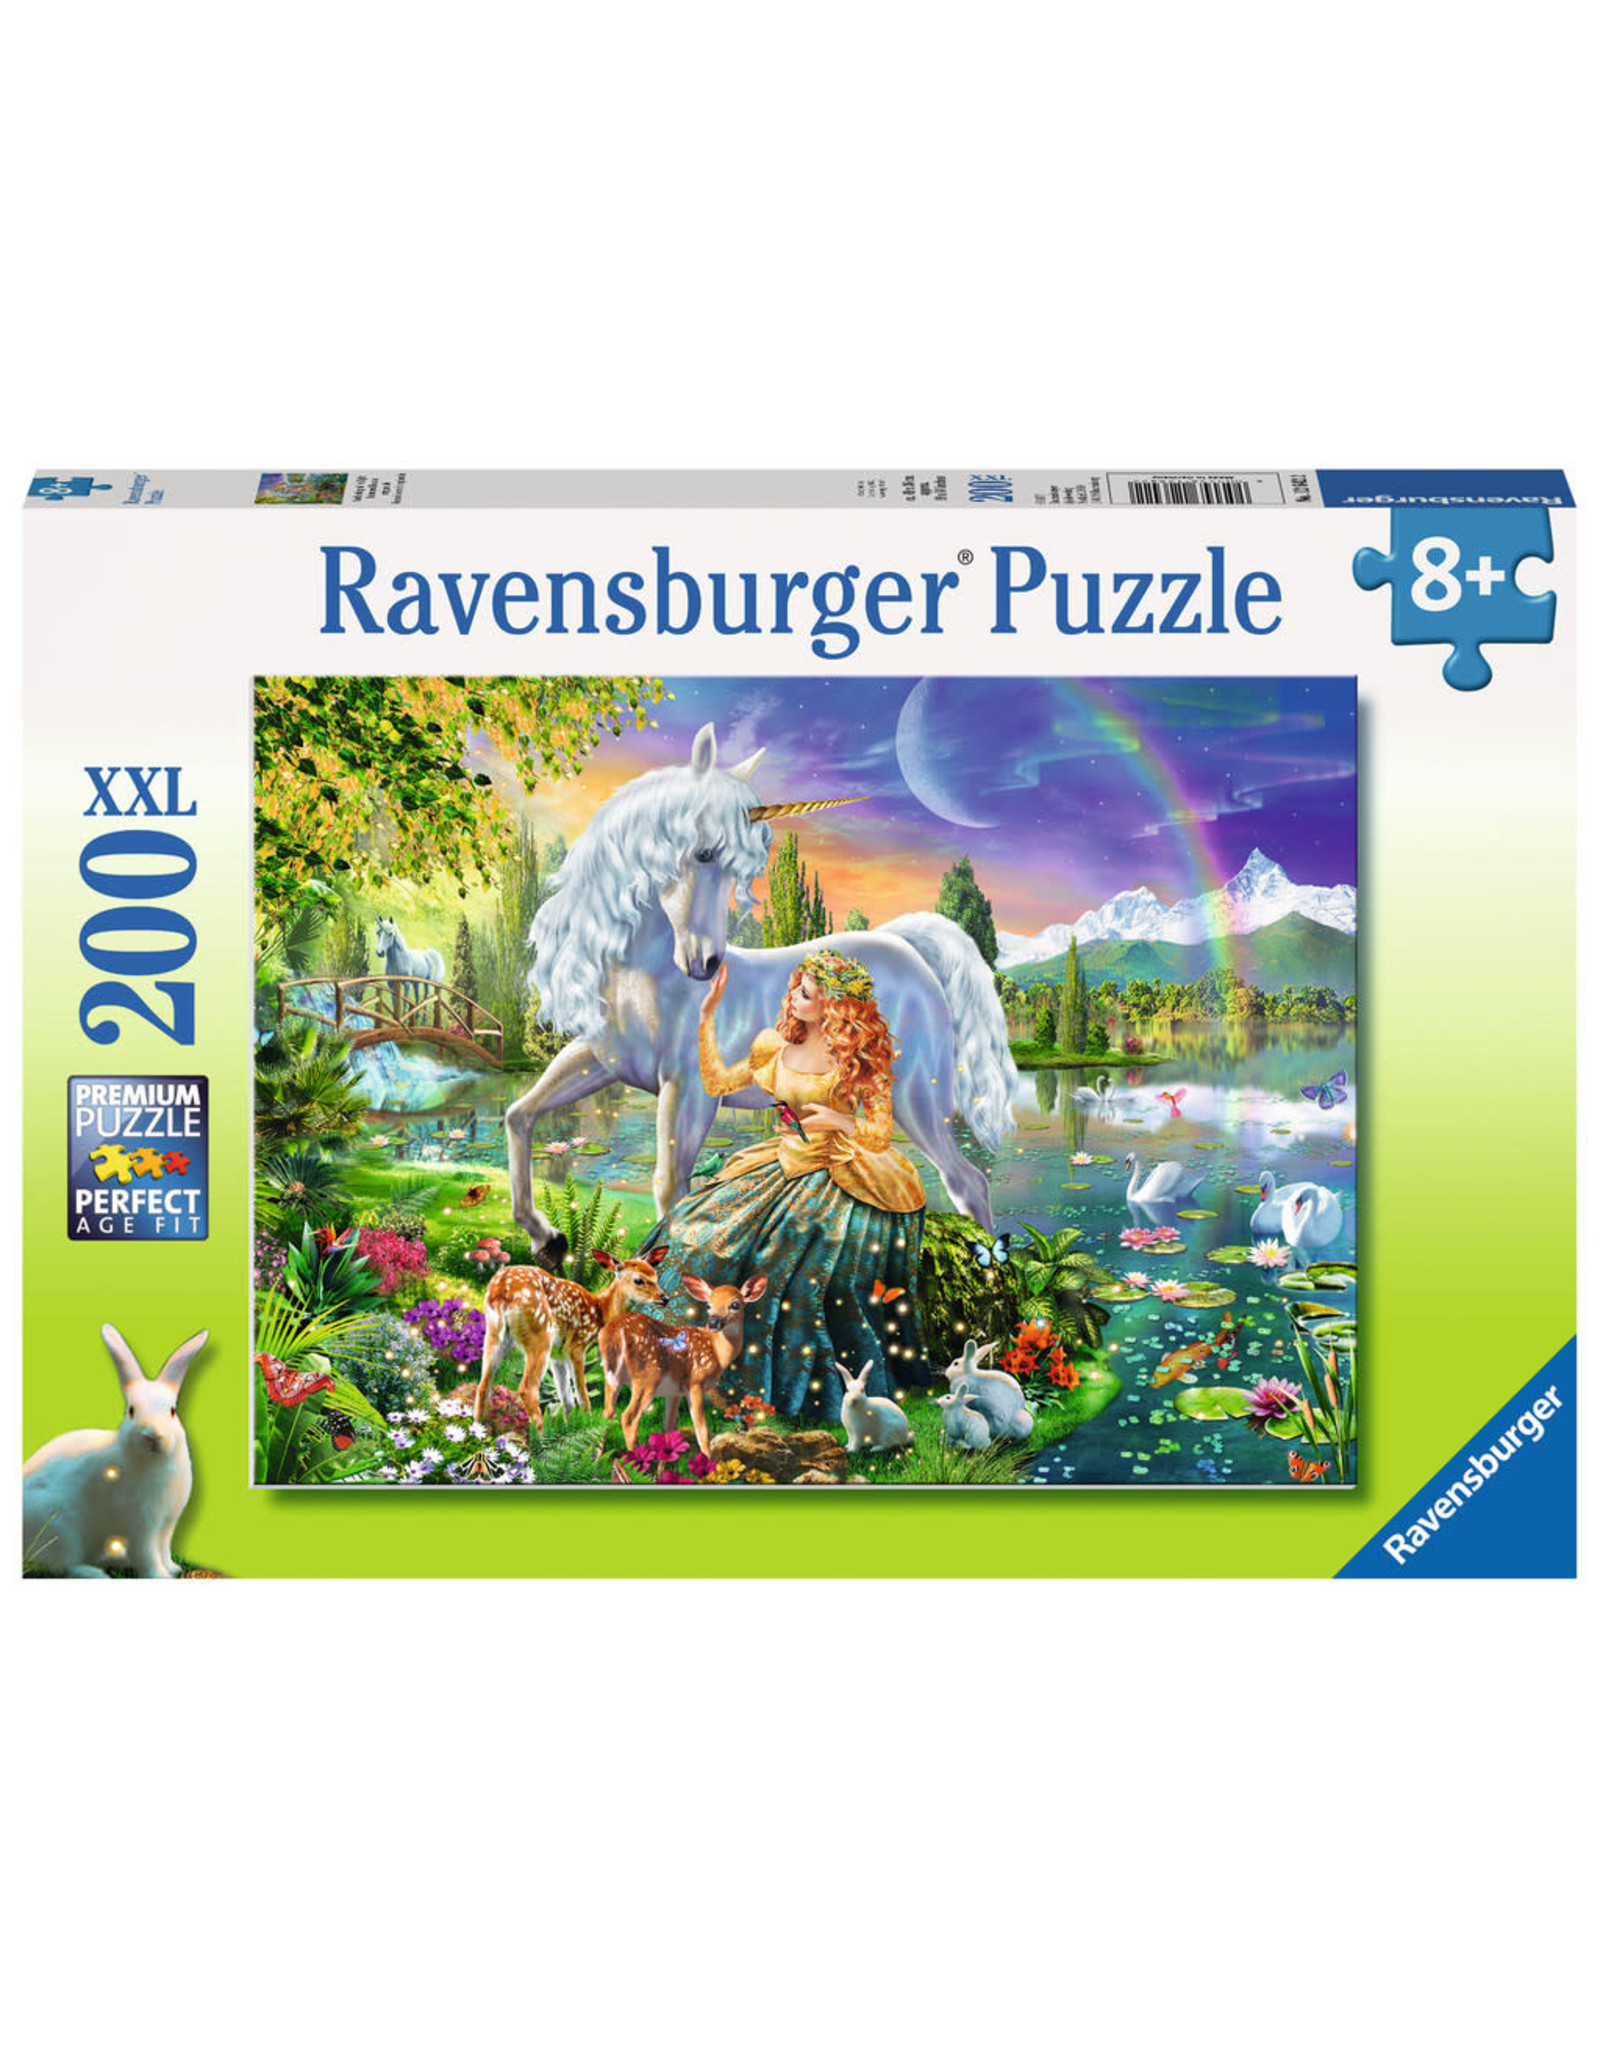 Ravensburger Gathering at Twilight 200pc Puzzle